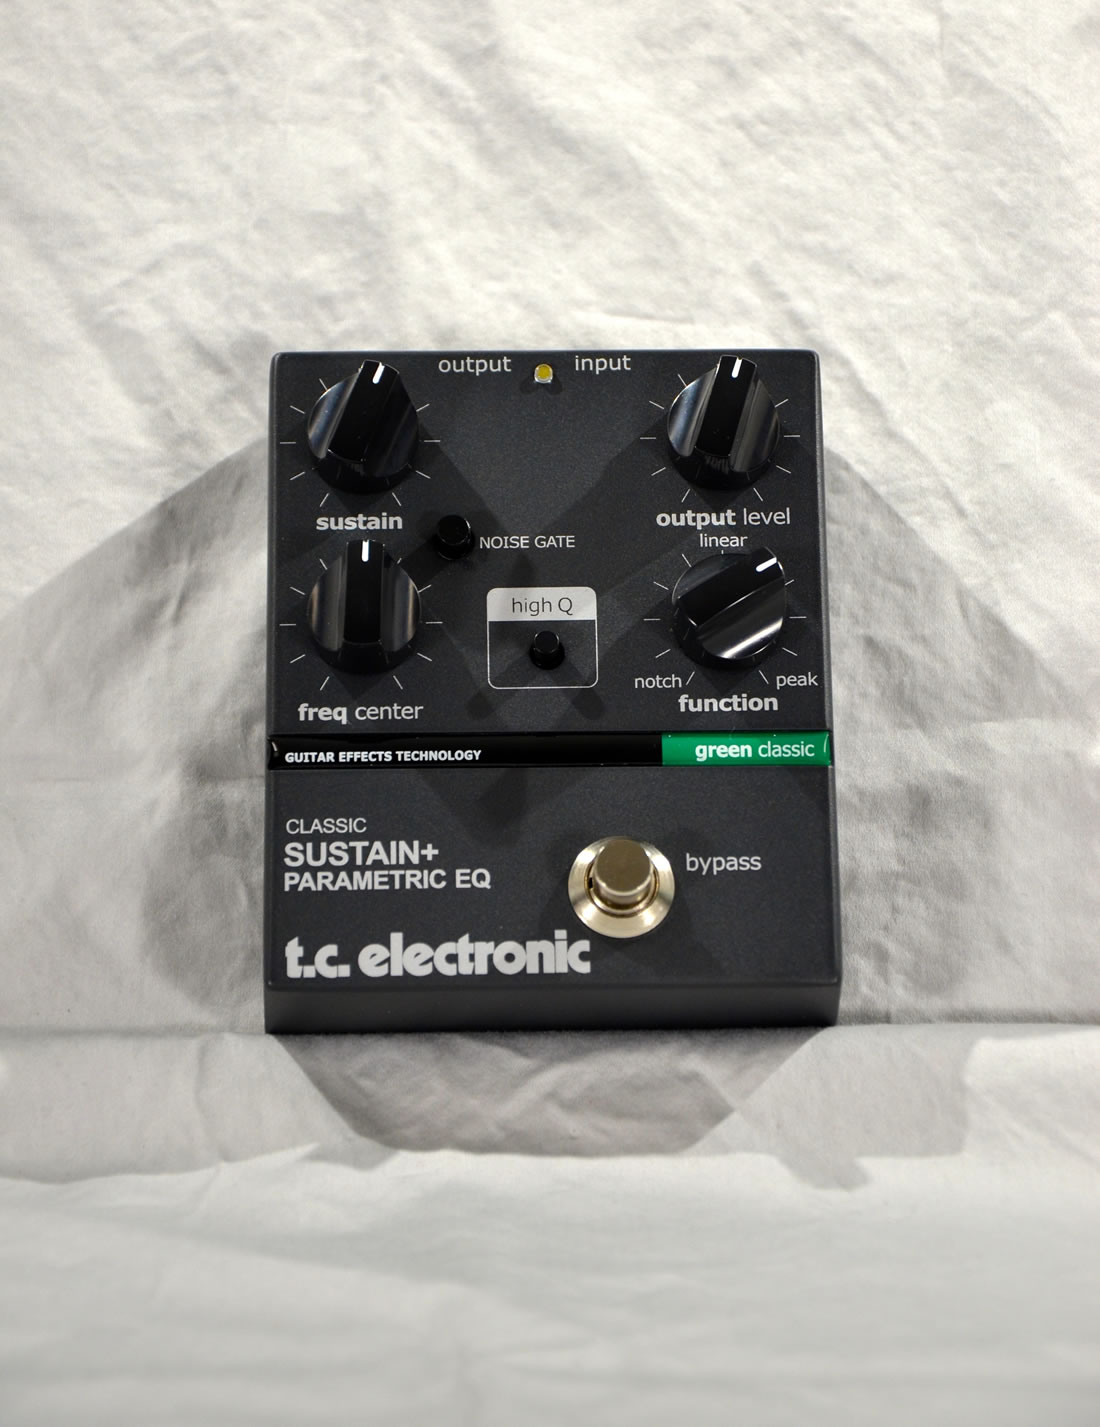 t. c. electronics Classic Sustain + Parametric EQ